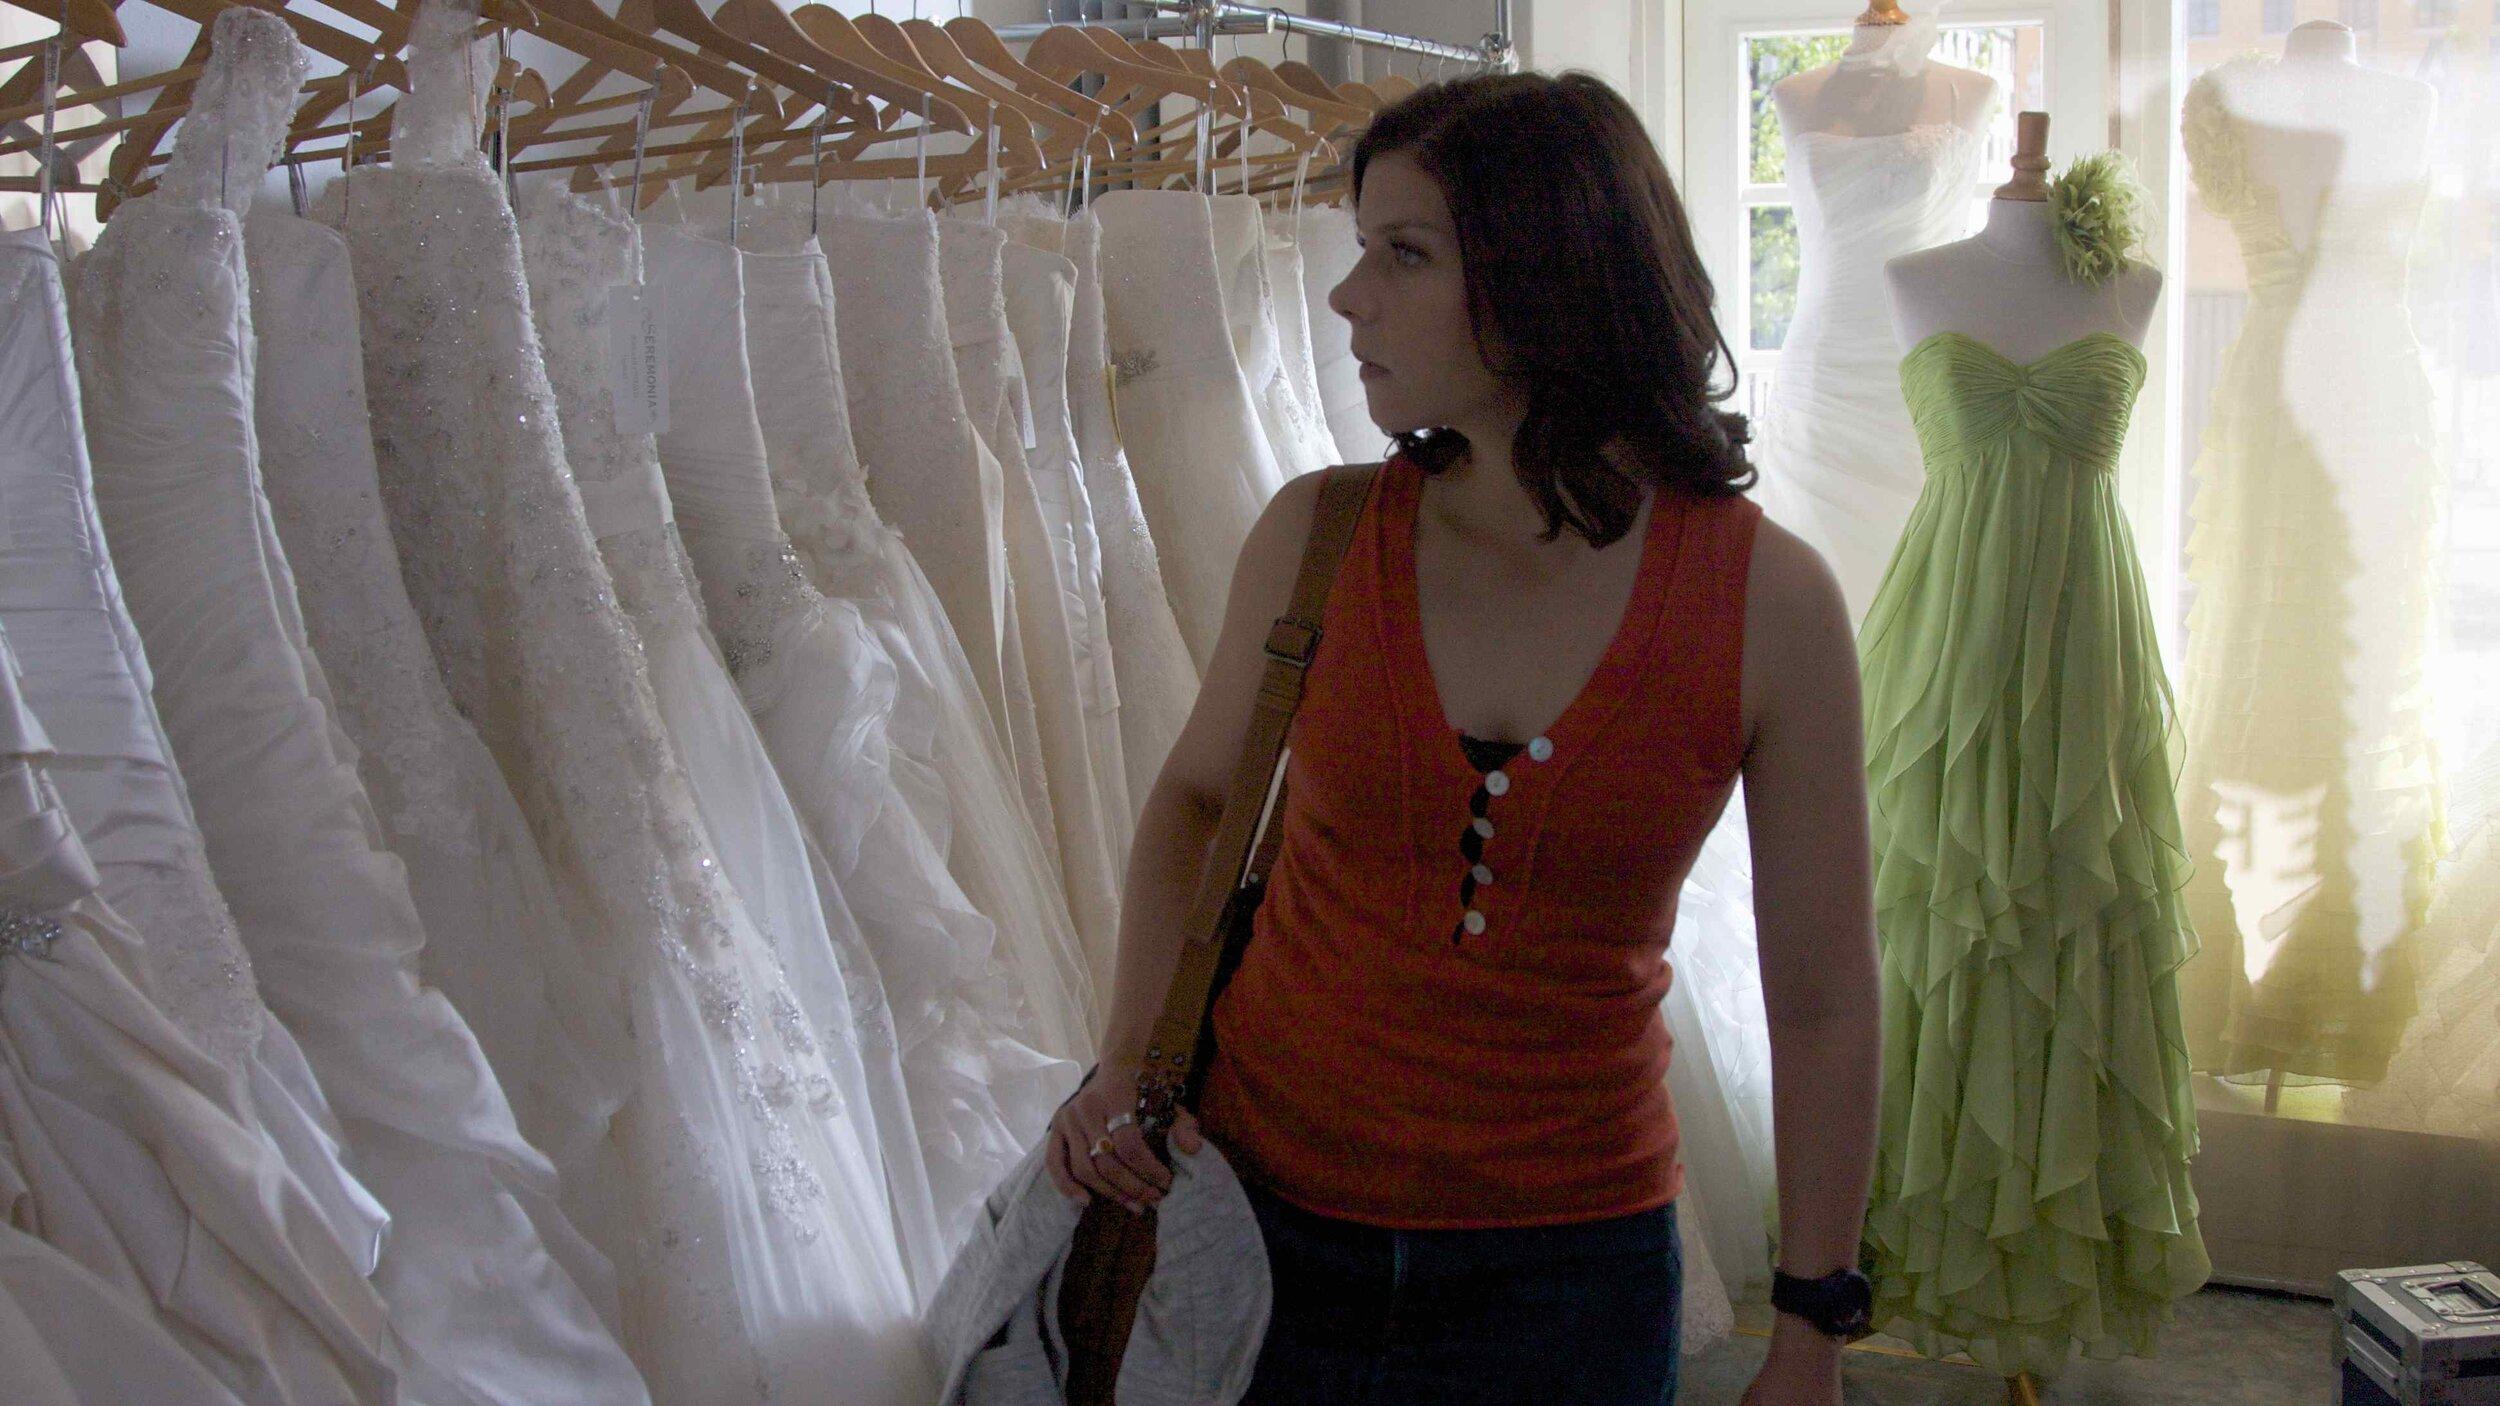 SANNA in wedding dress shop 2_sm.jpg